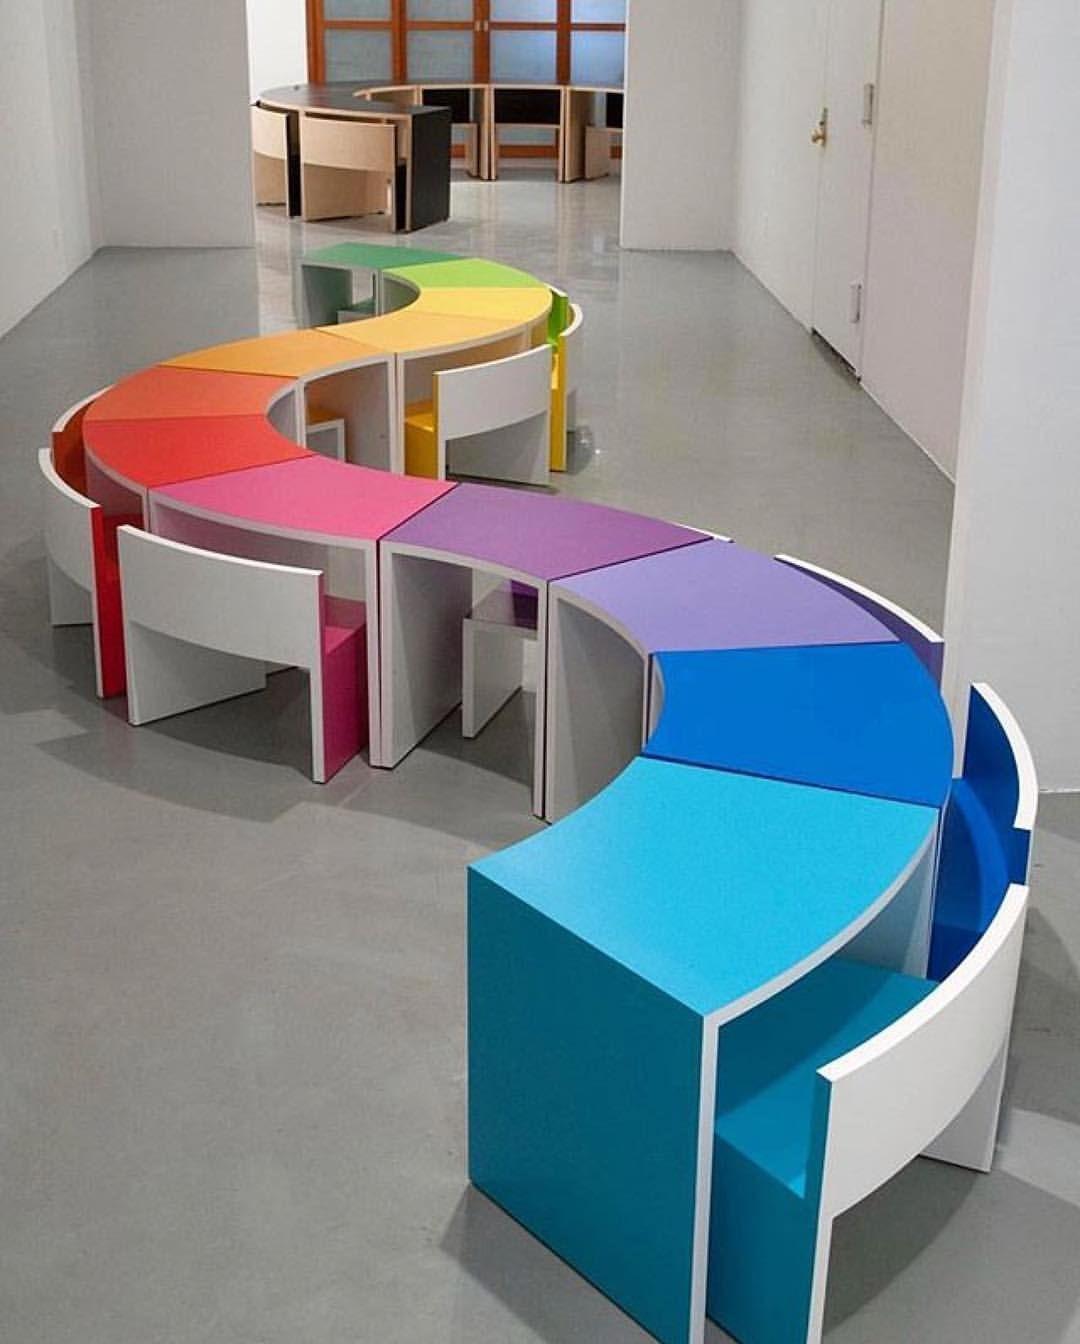 Daycare Design By Brendakaraana On Home Interior Ideas In